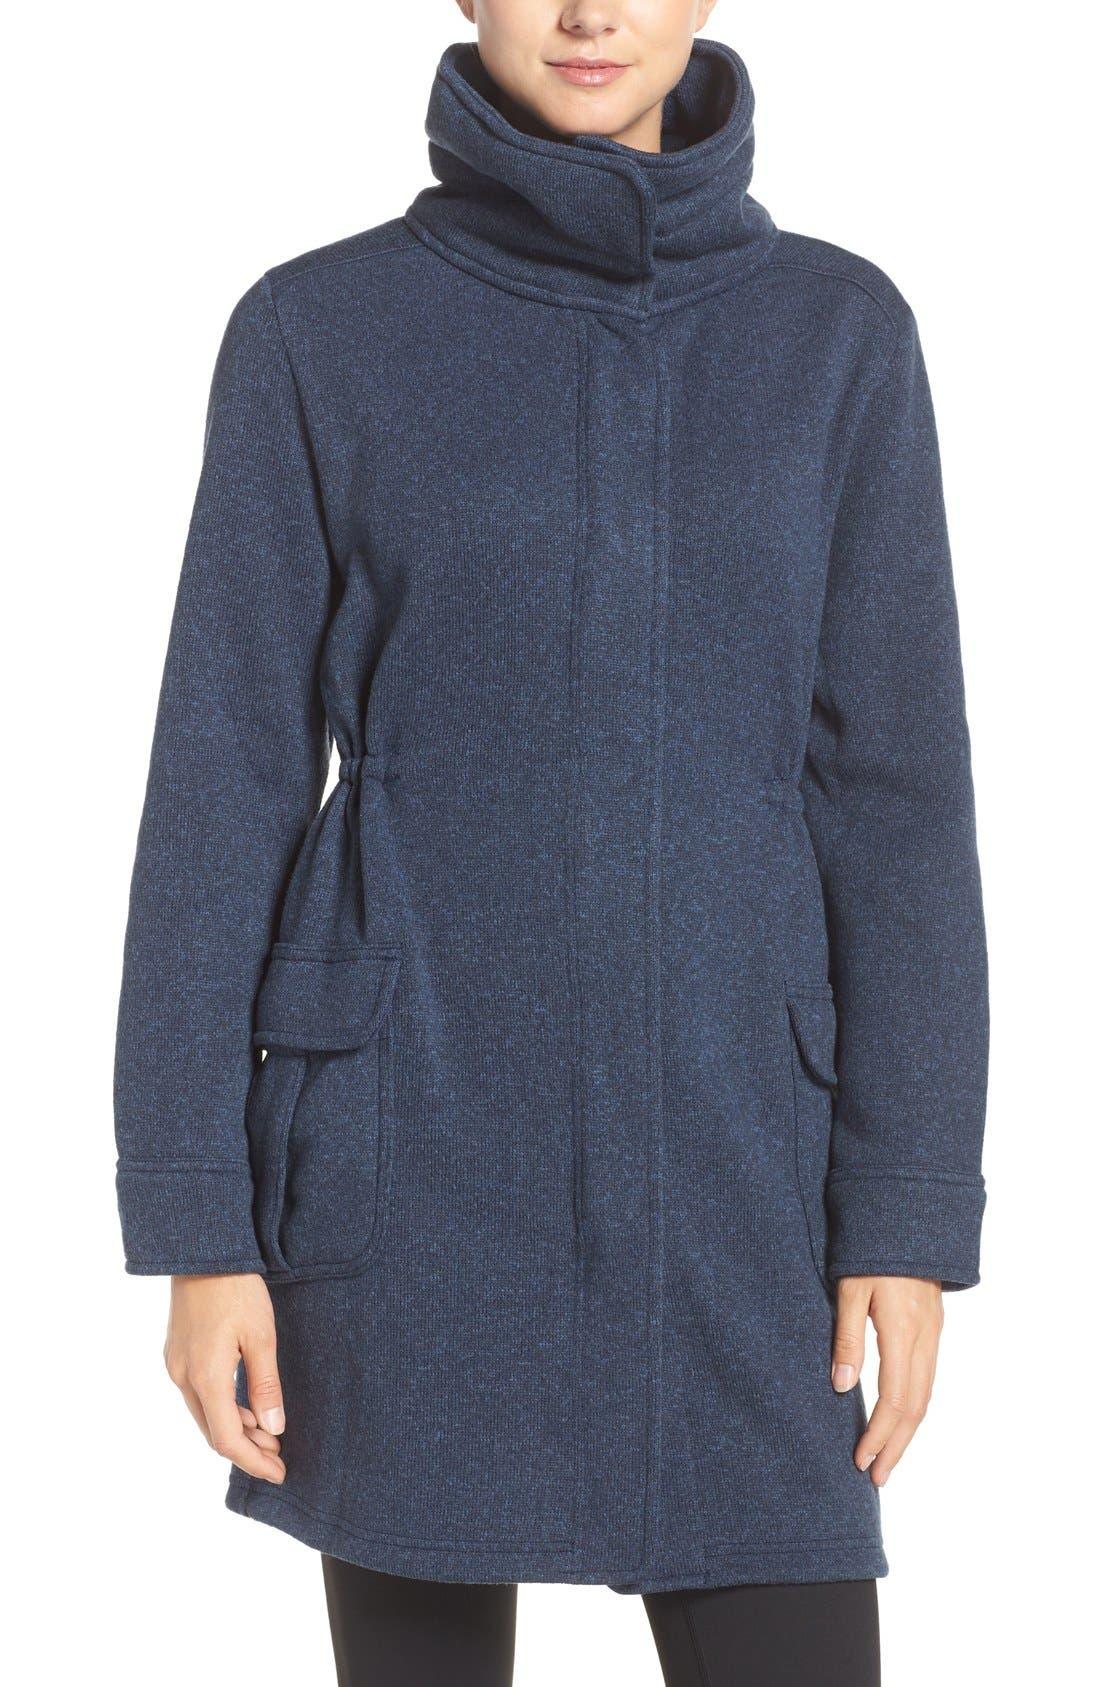 'Better Sweater<sup>®</sup>' Fleece Coat,                             Main thumbnail 1, color,                             Classic Navy